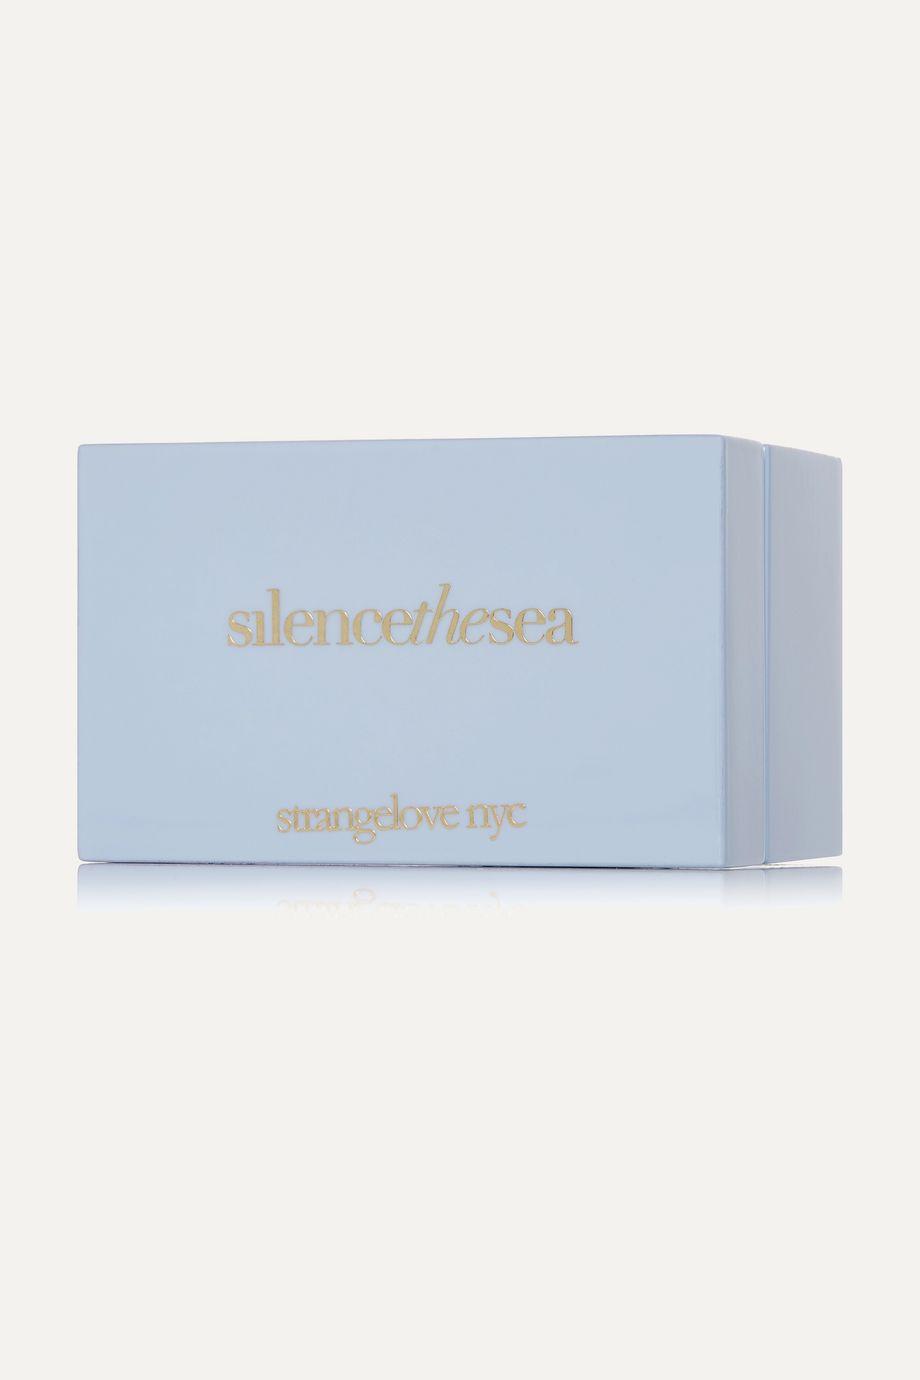 strangelove nyc Perfume Oil Travel Set - silencethesea, 3 x 1.25ml